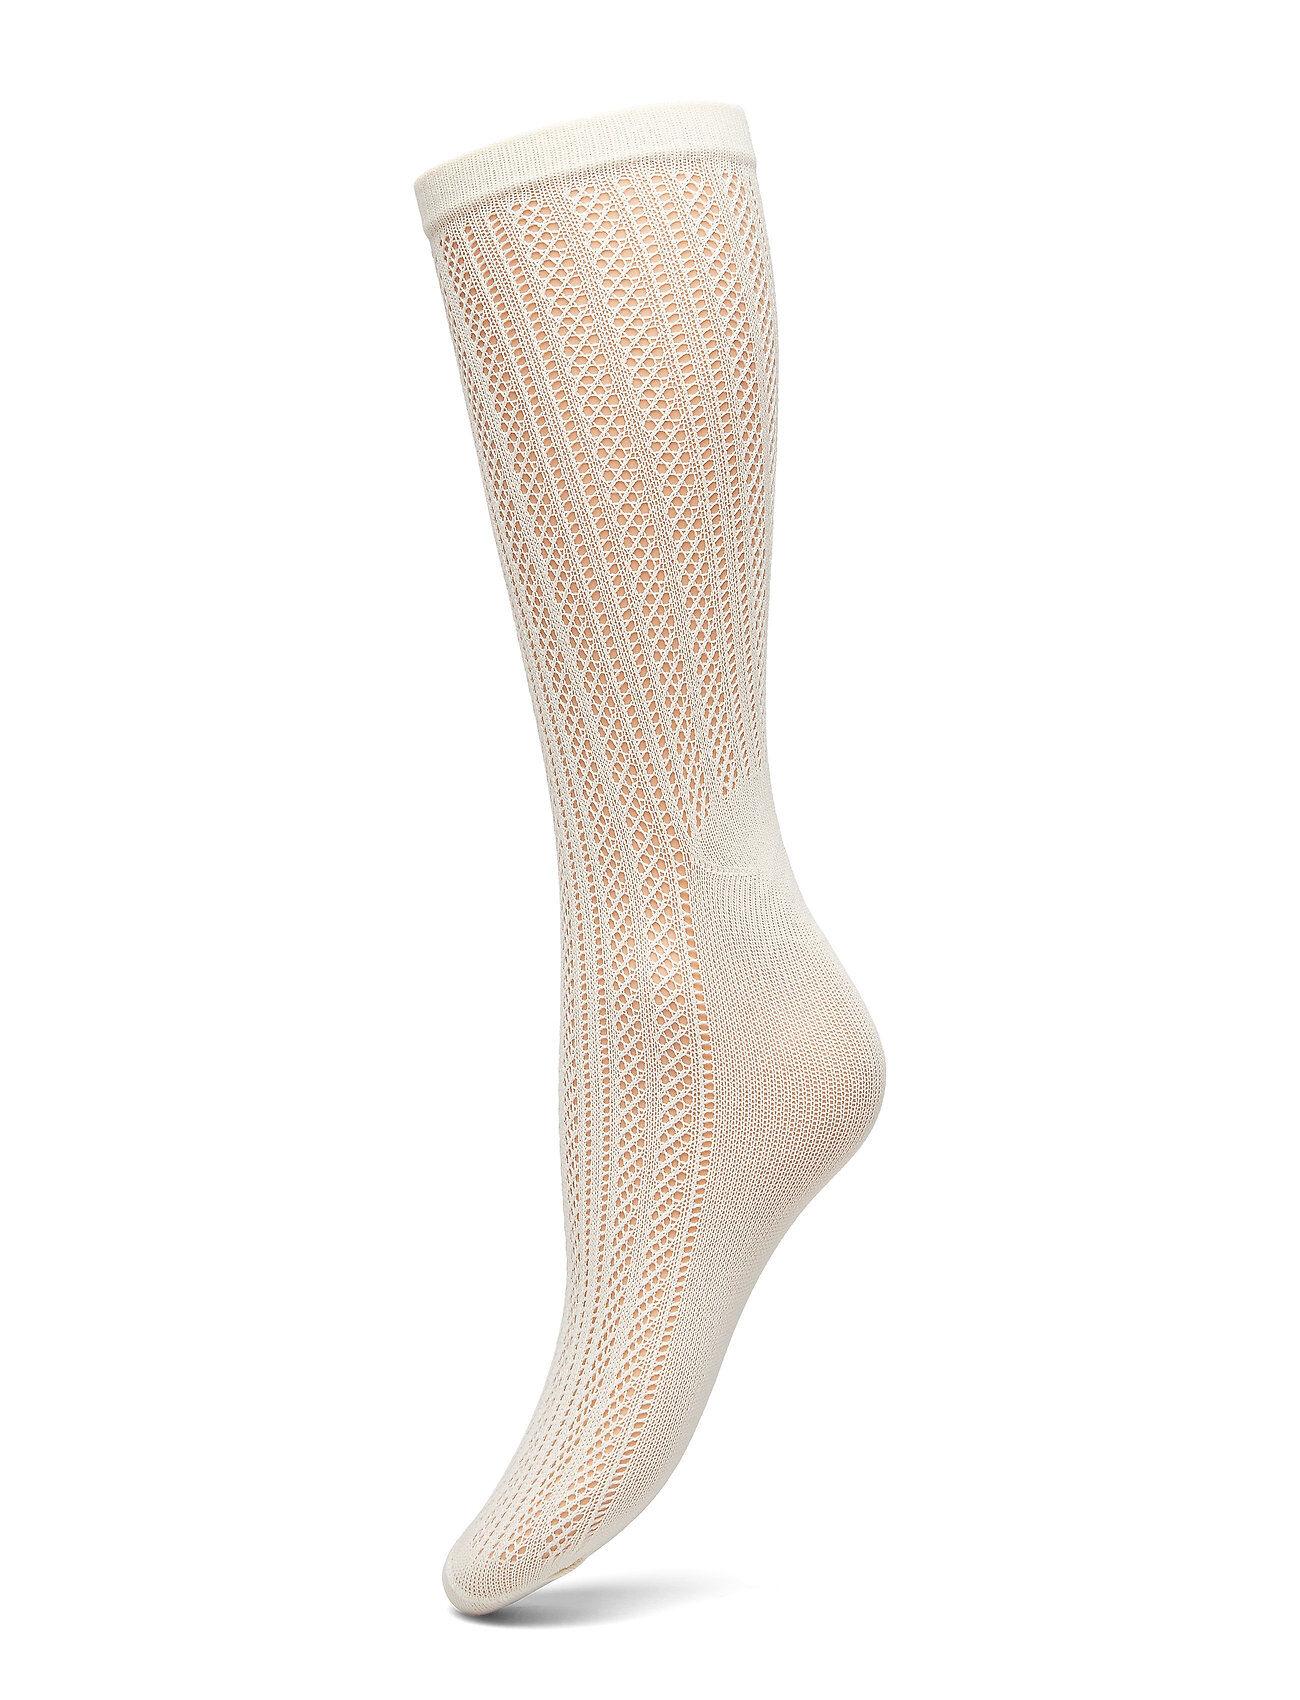 Swedish Stockings Klara Knit Sock Lingerie Hosiery Socks Kermanvärinen Swedish Stockings